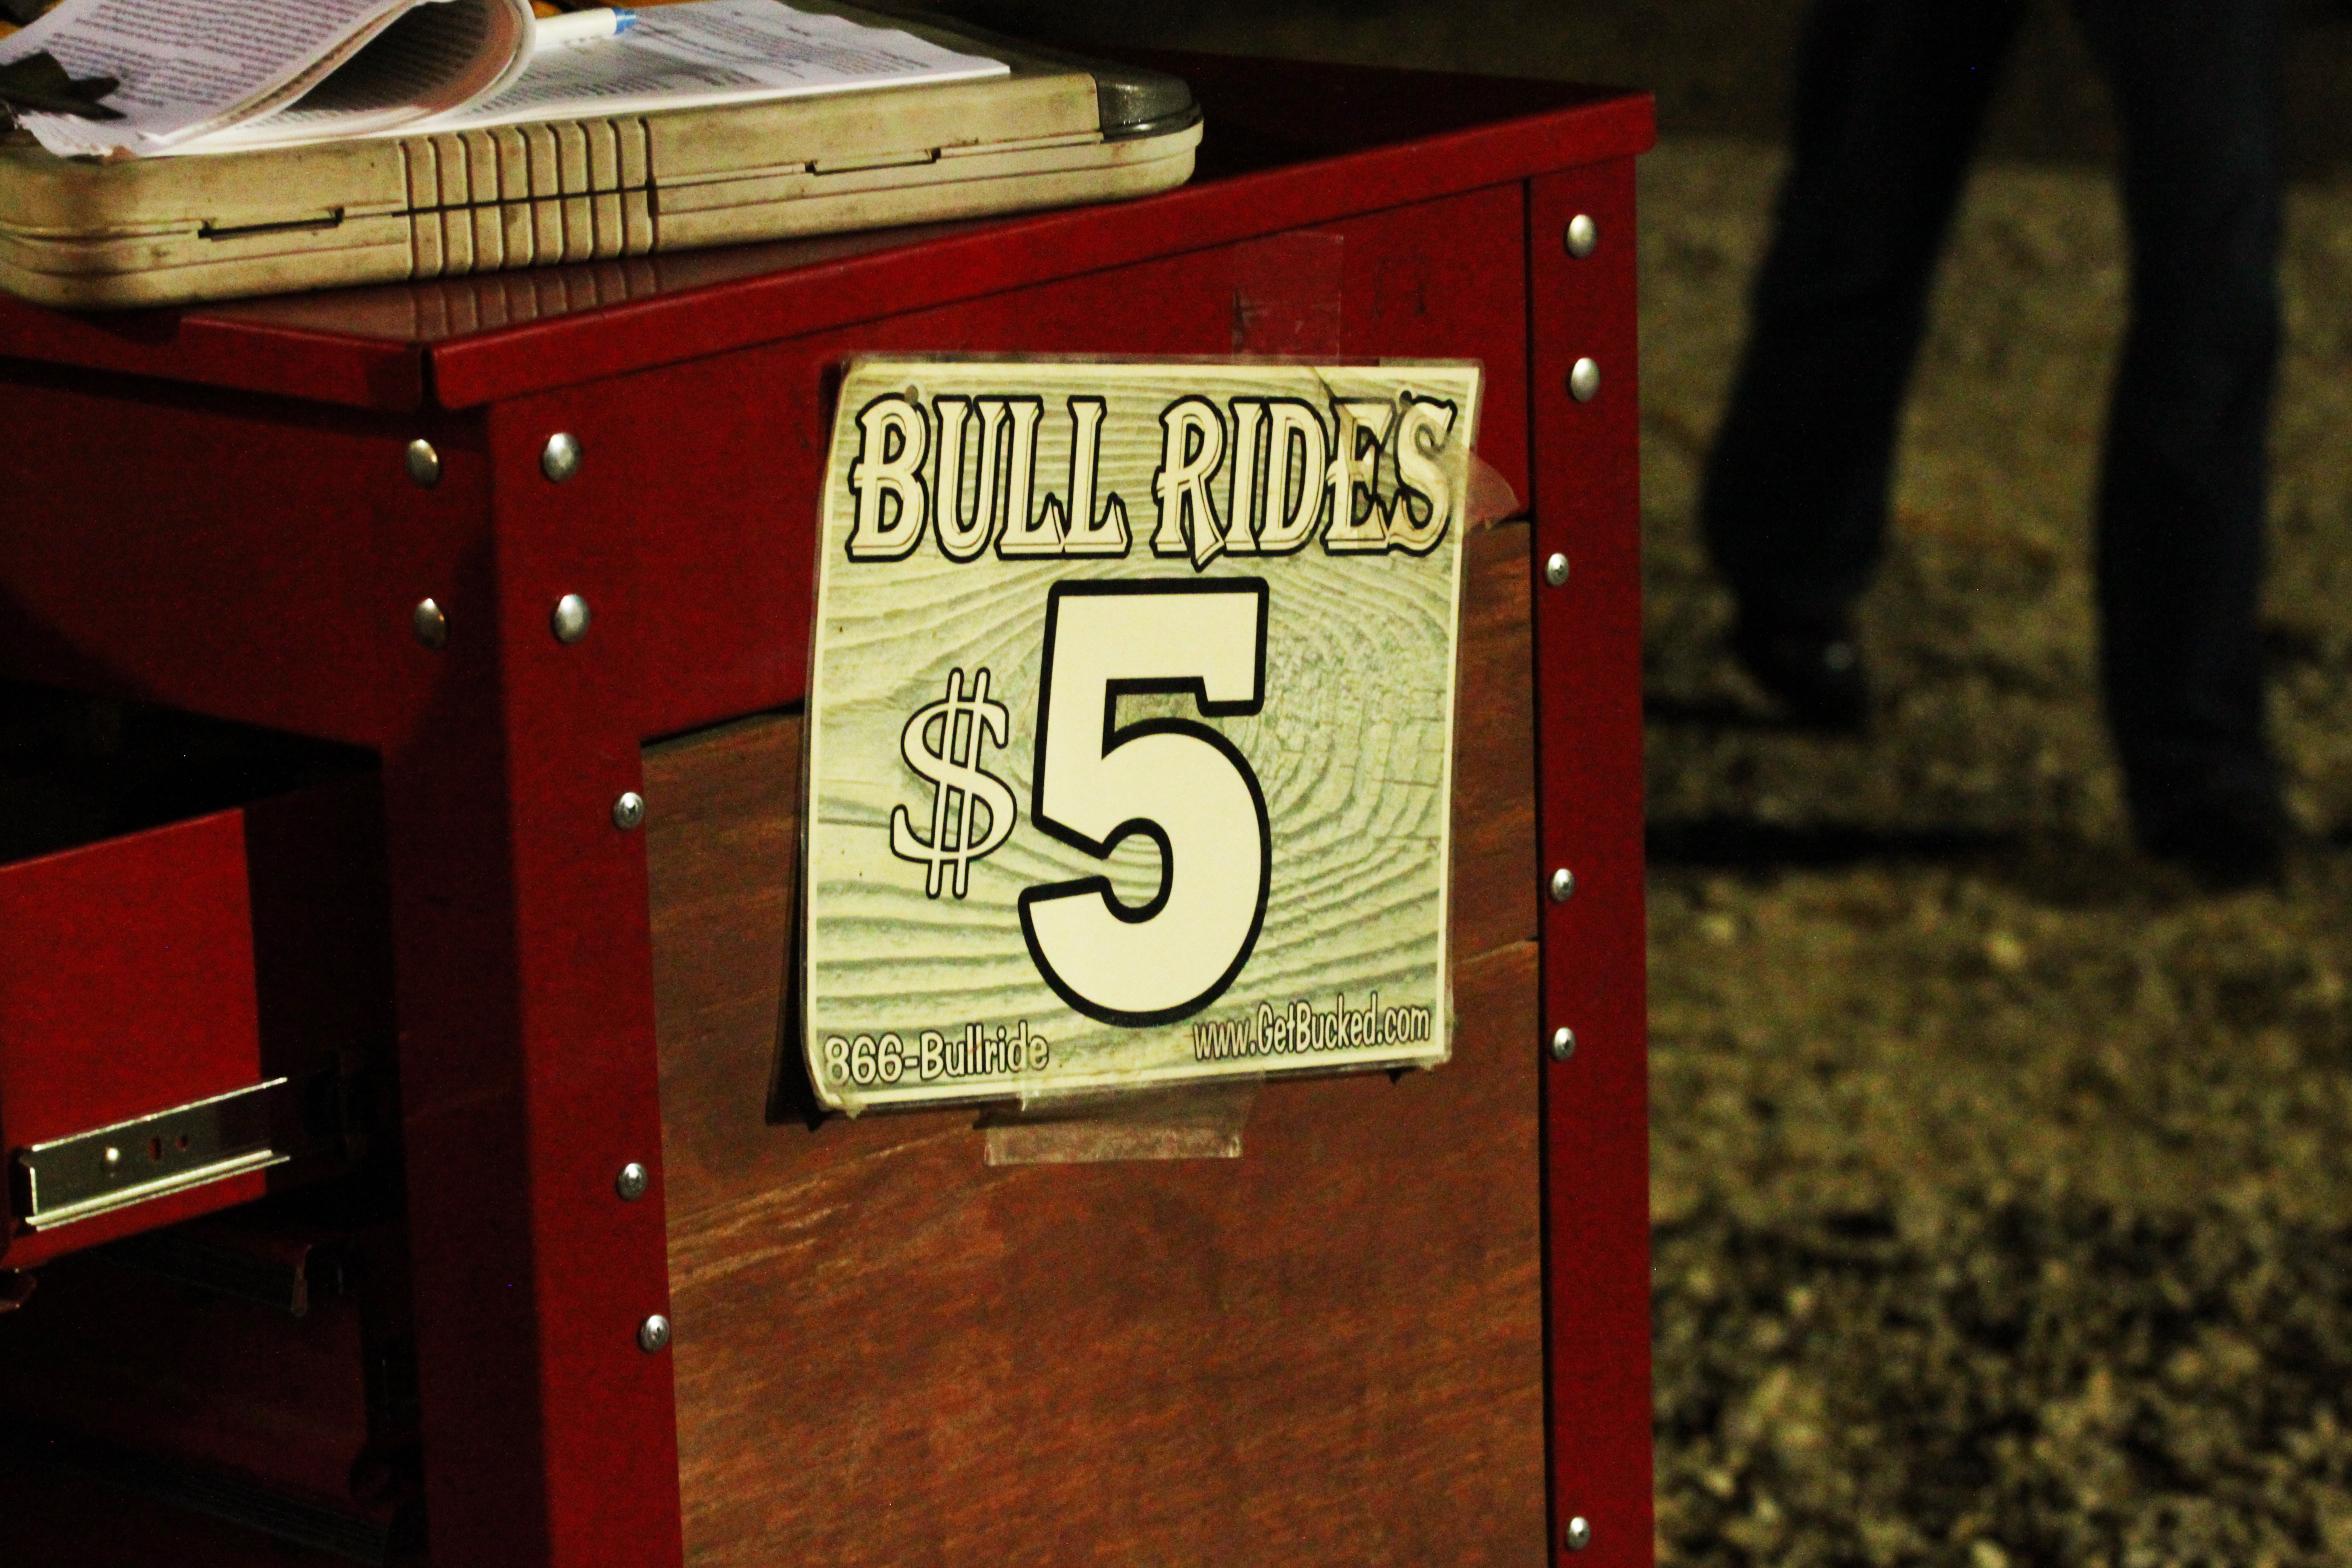 BullRides$5